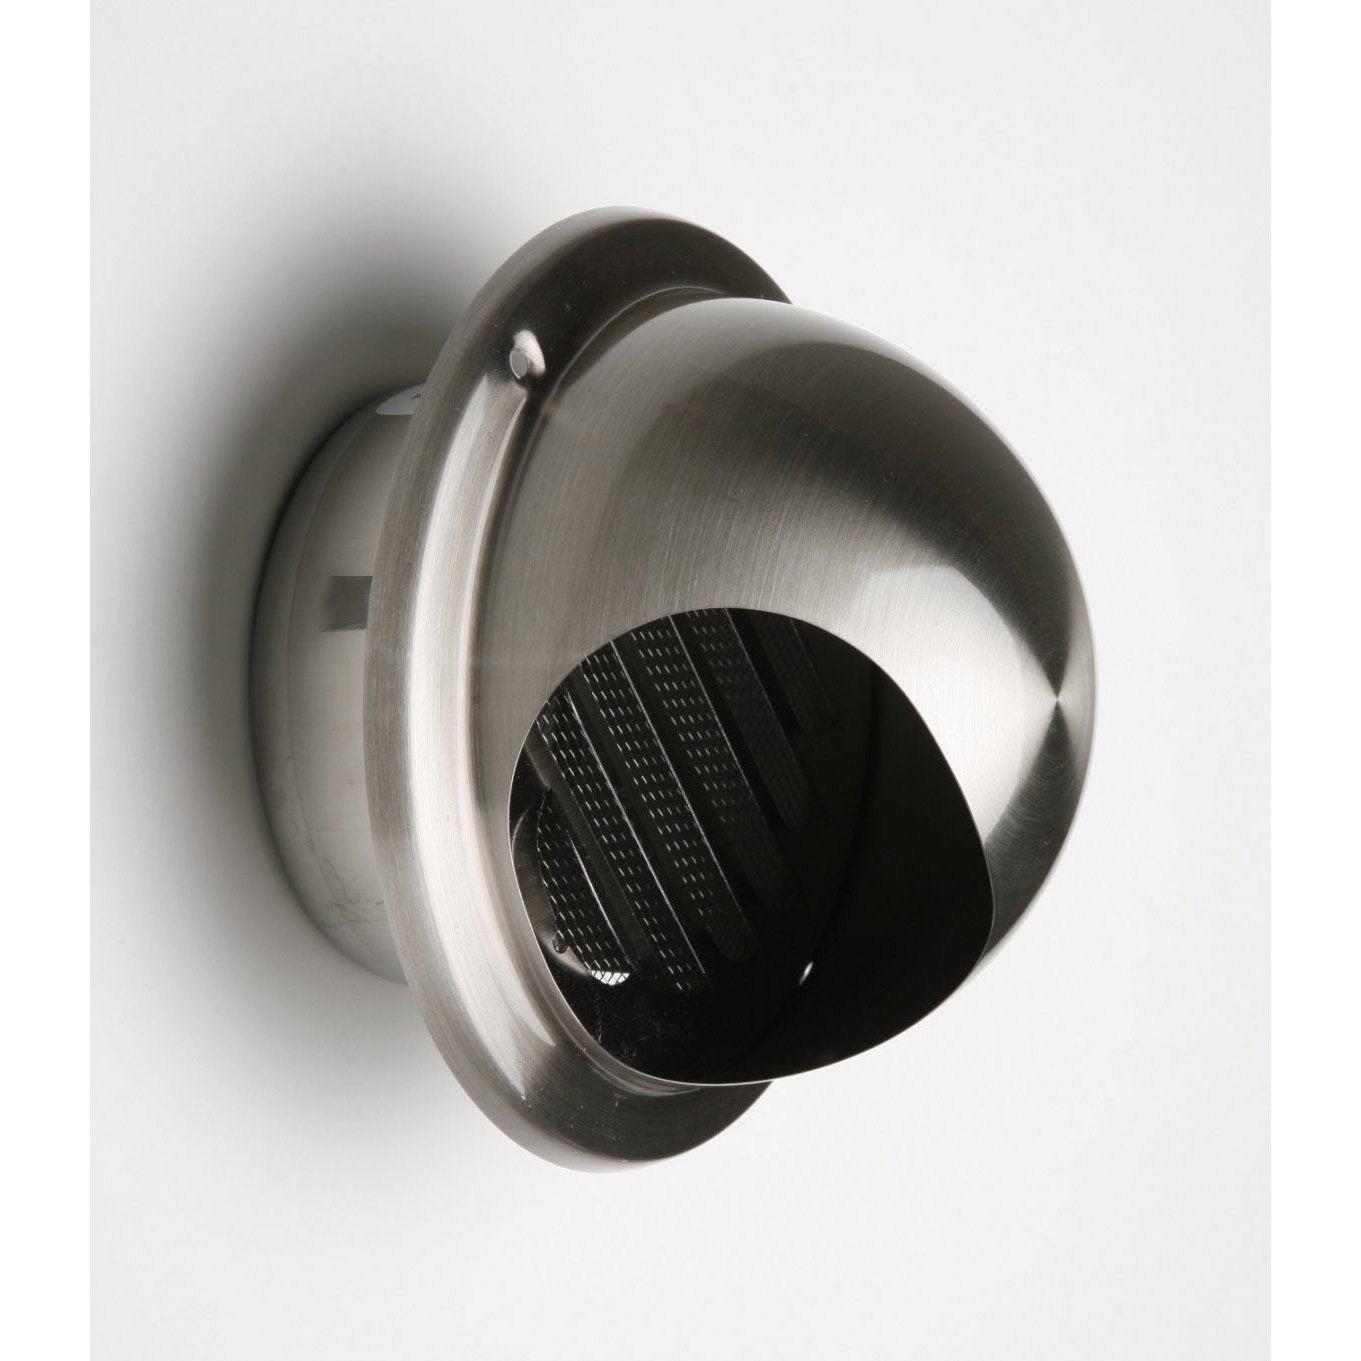 tuyau eau chaude bouchee inox. Black Bedroom Furniture Sets. Home Design Ideas